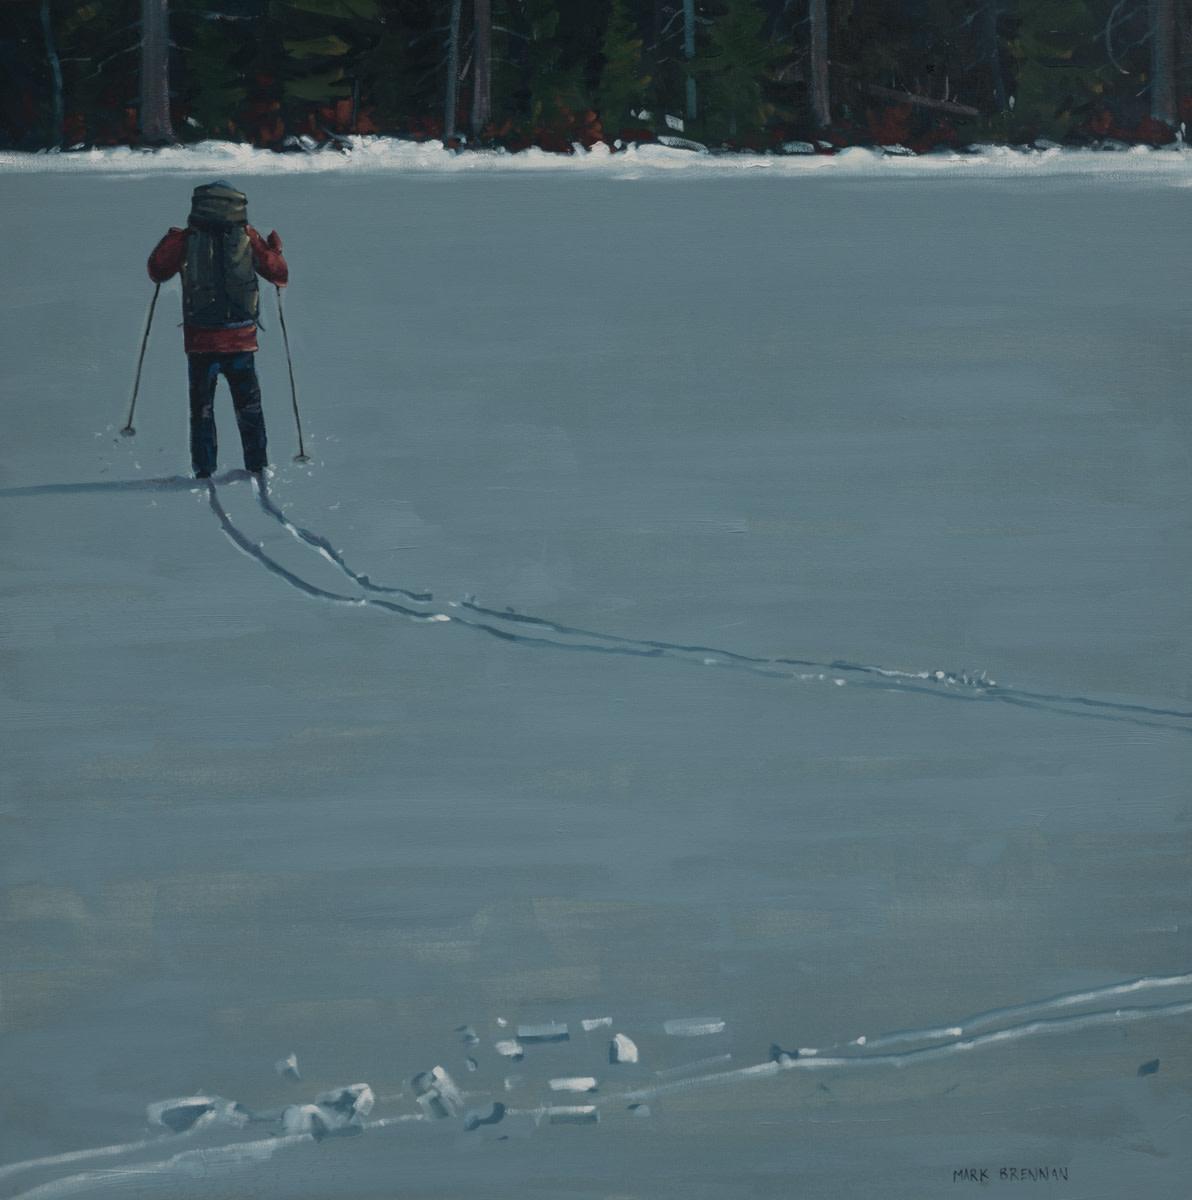 Lake Crossing by Mark Brennan